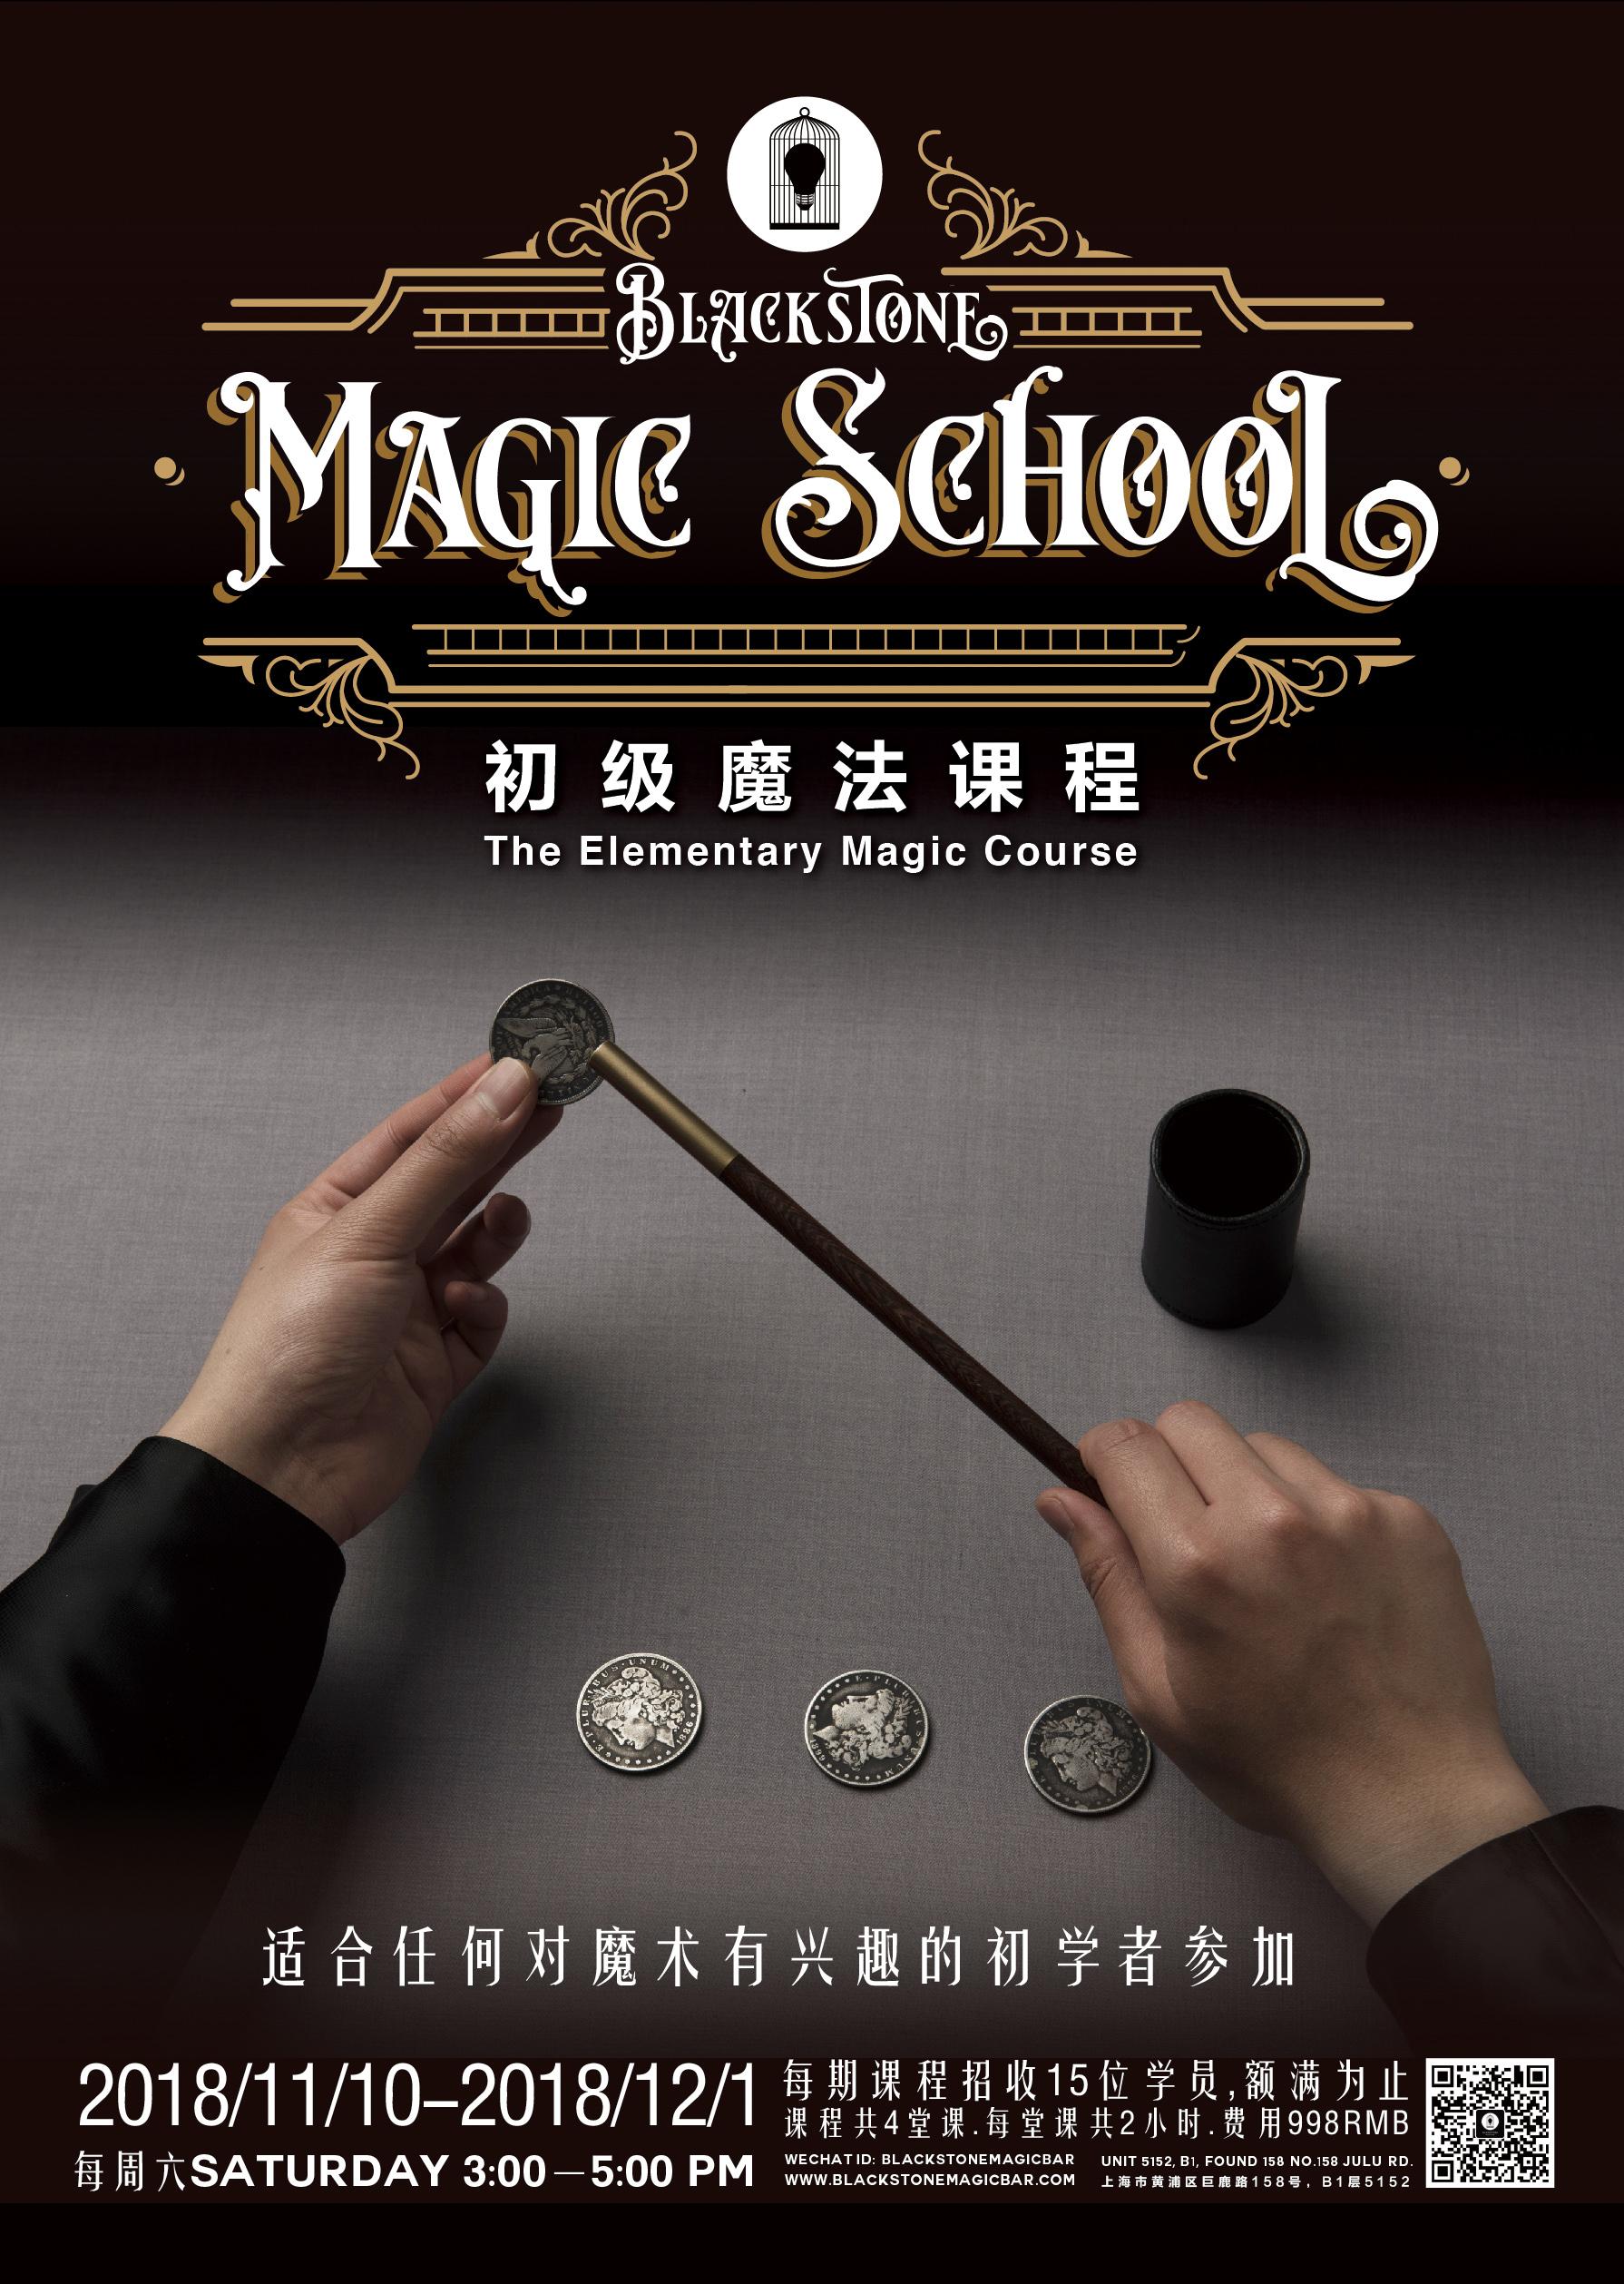 Blackstone Magic School - 全新初级课程